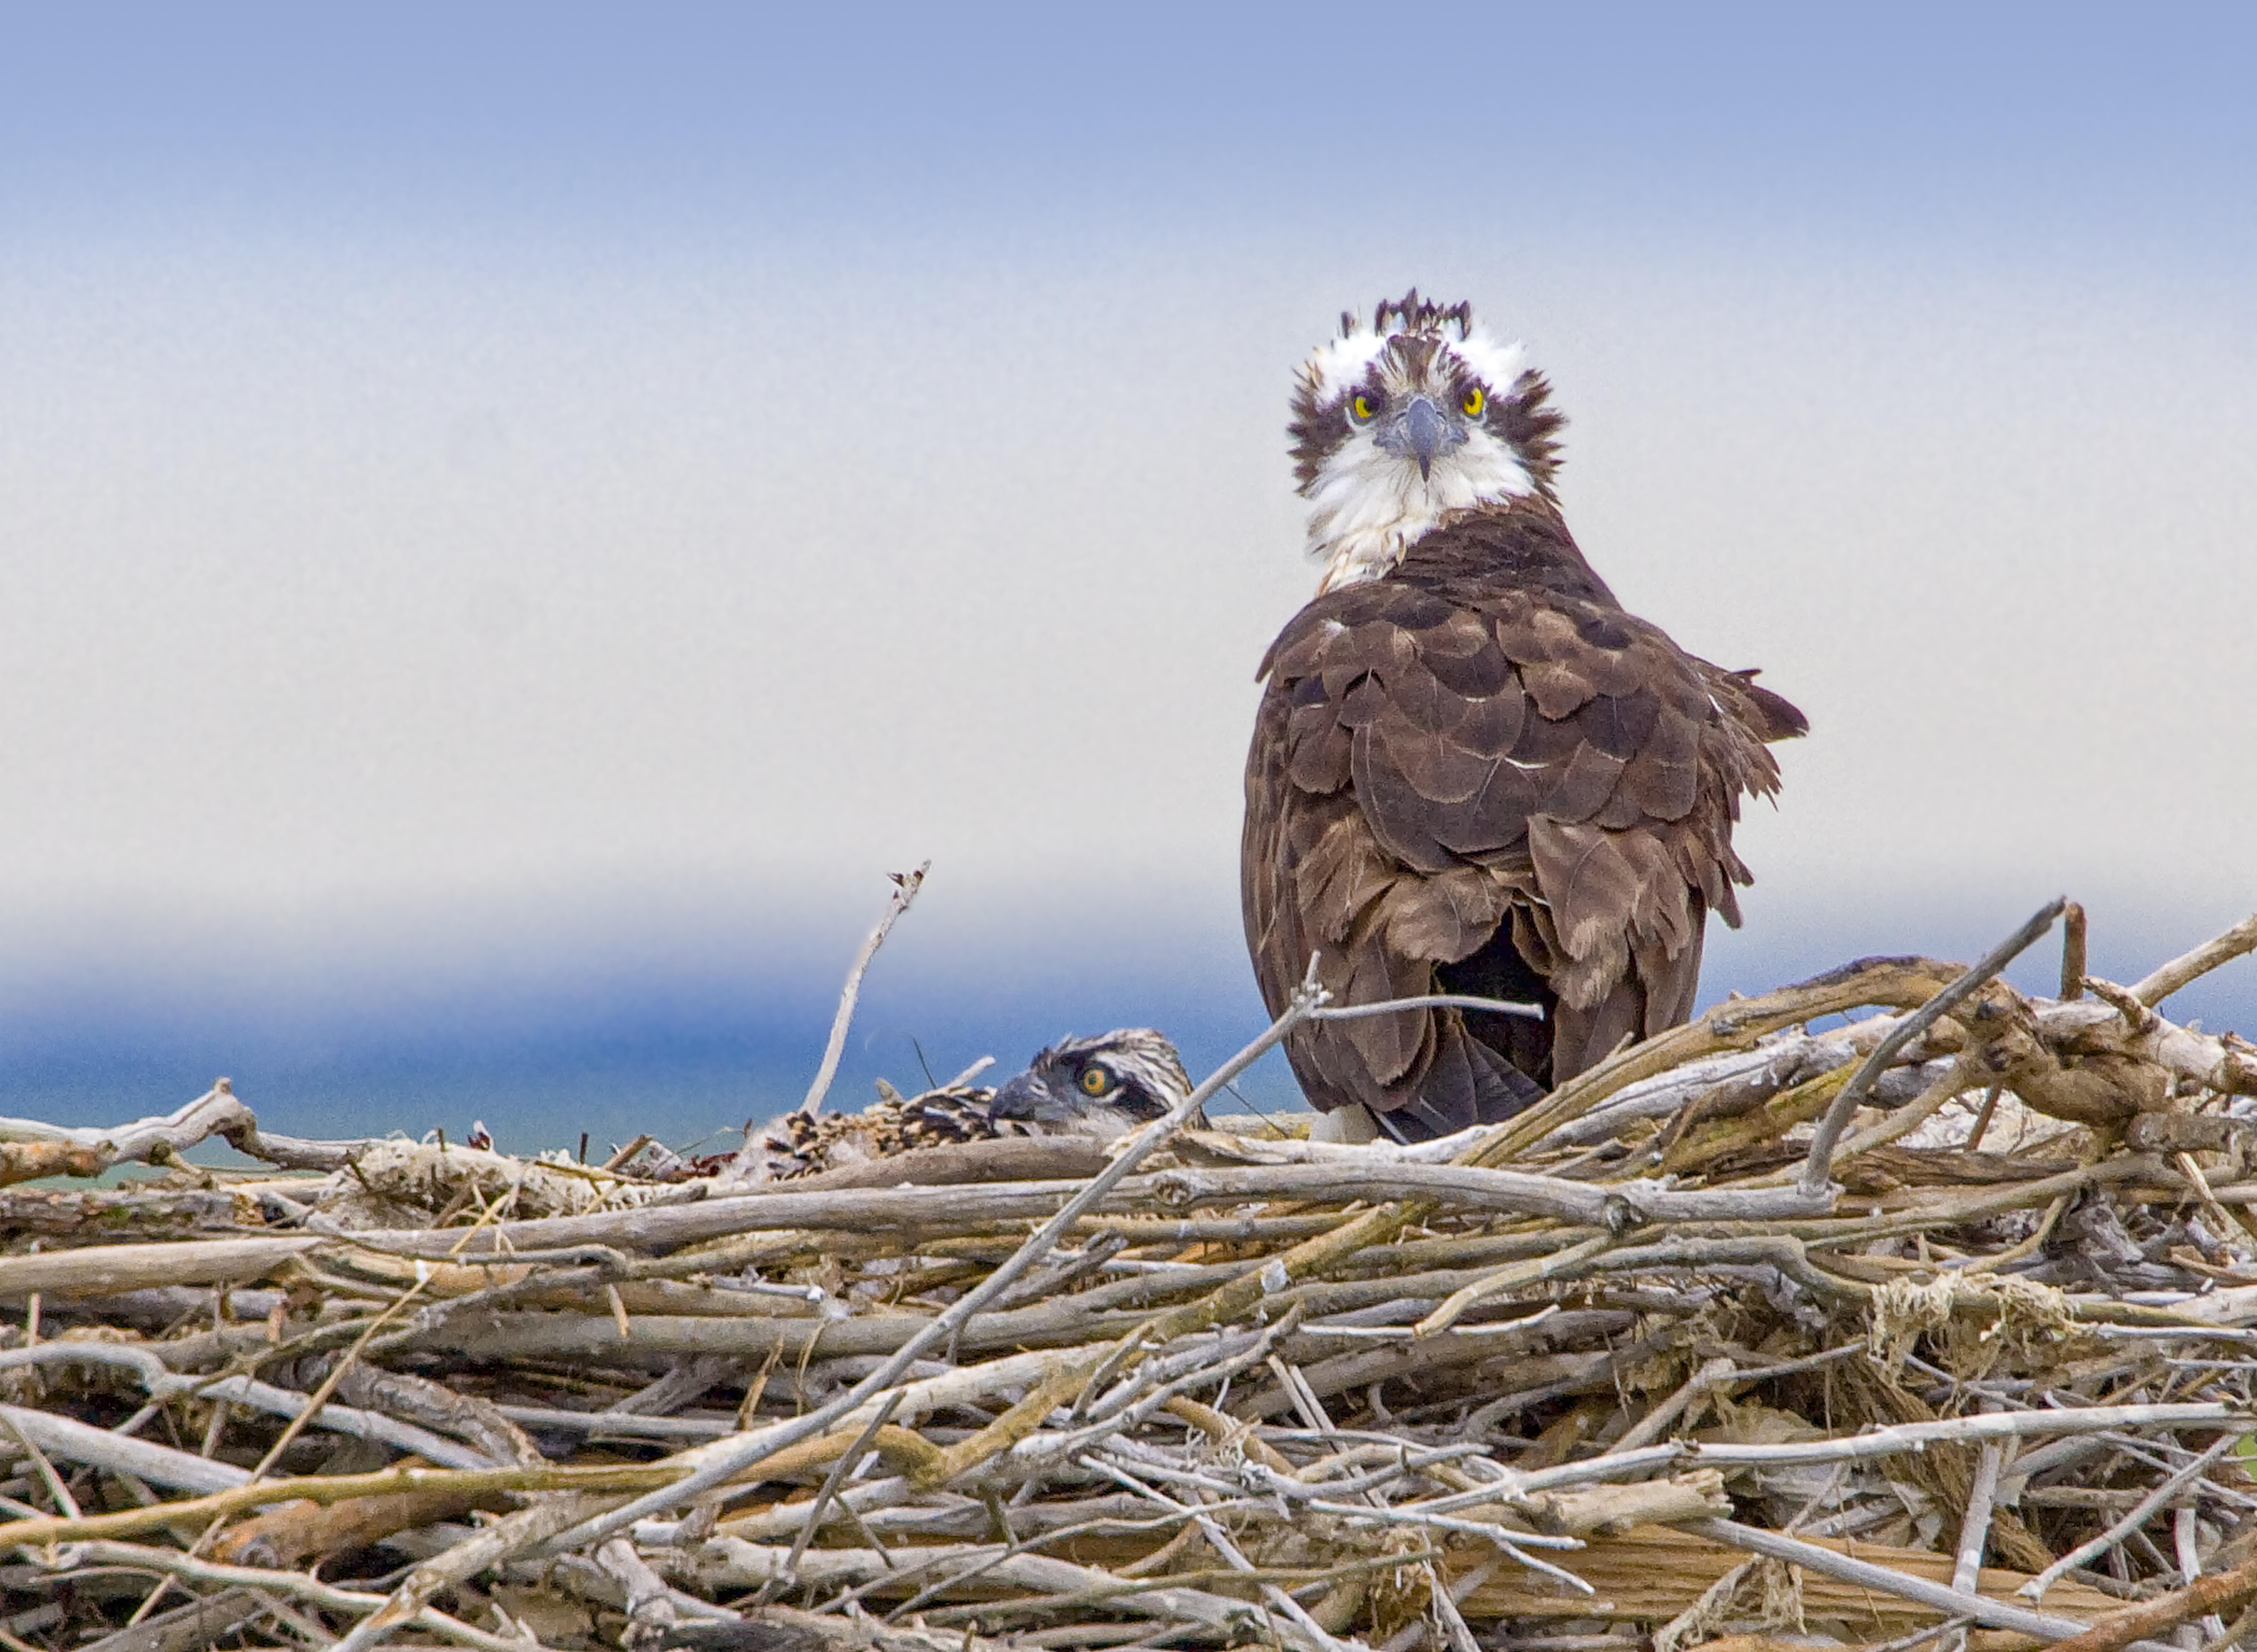 Osprey Nest 1280mm v2 crop_MG_4861